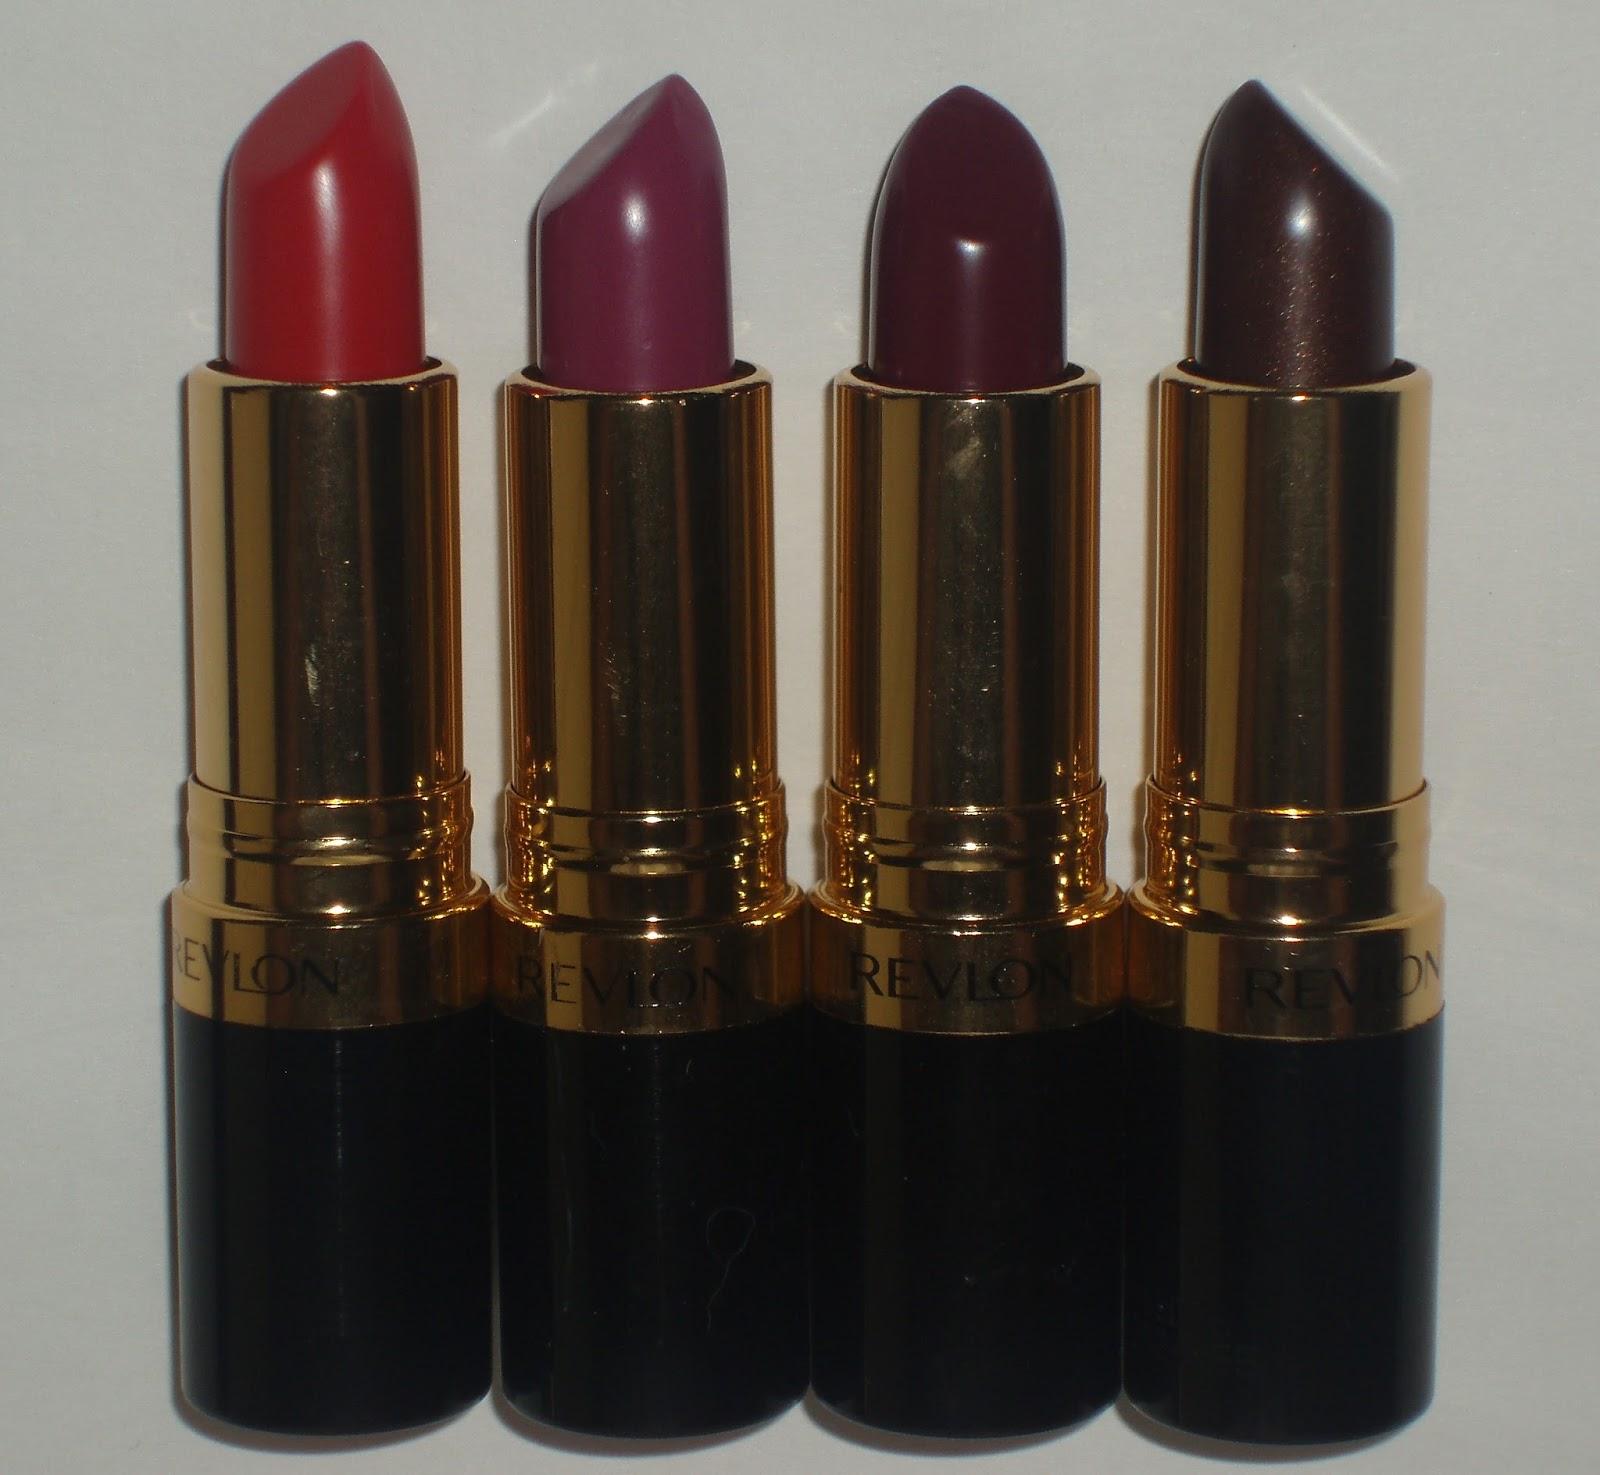 3.bp.blogspot.com_-e69f8NrrAD4_Ub4xNr1WlmI_AAAAAAAAIFA_AgV3GZNCmrM_s1600_P1010029+-+Revlon+Super+Lustrous+Shine+lipsticks